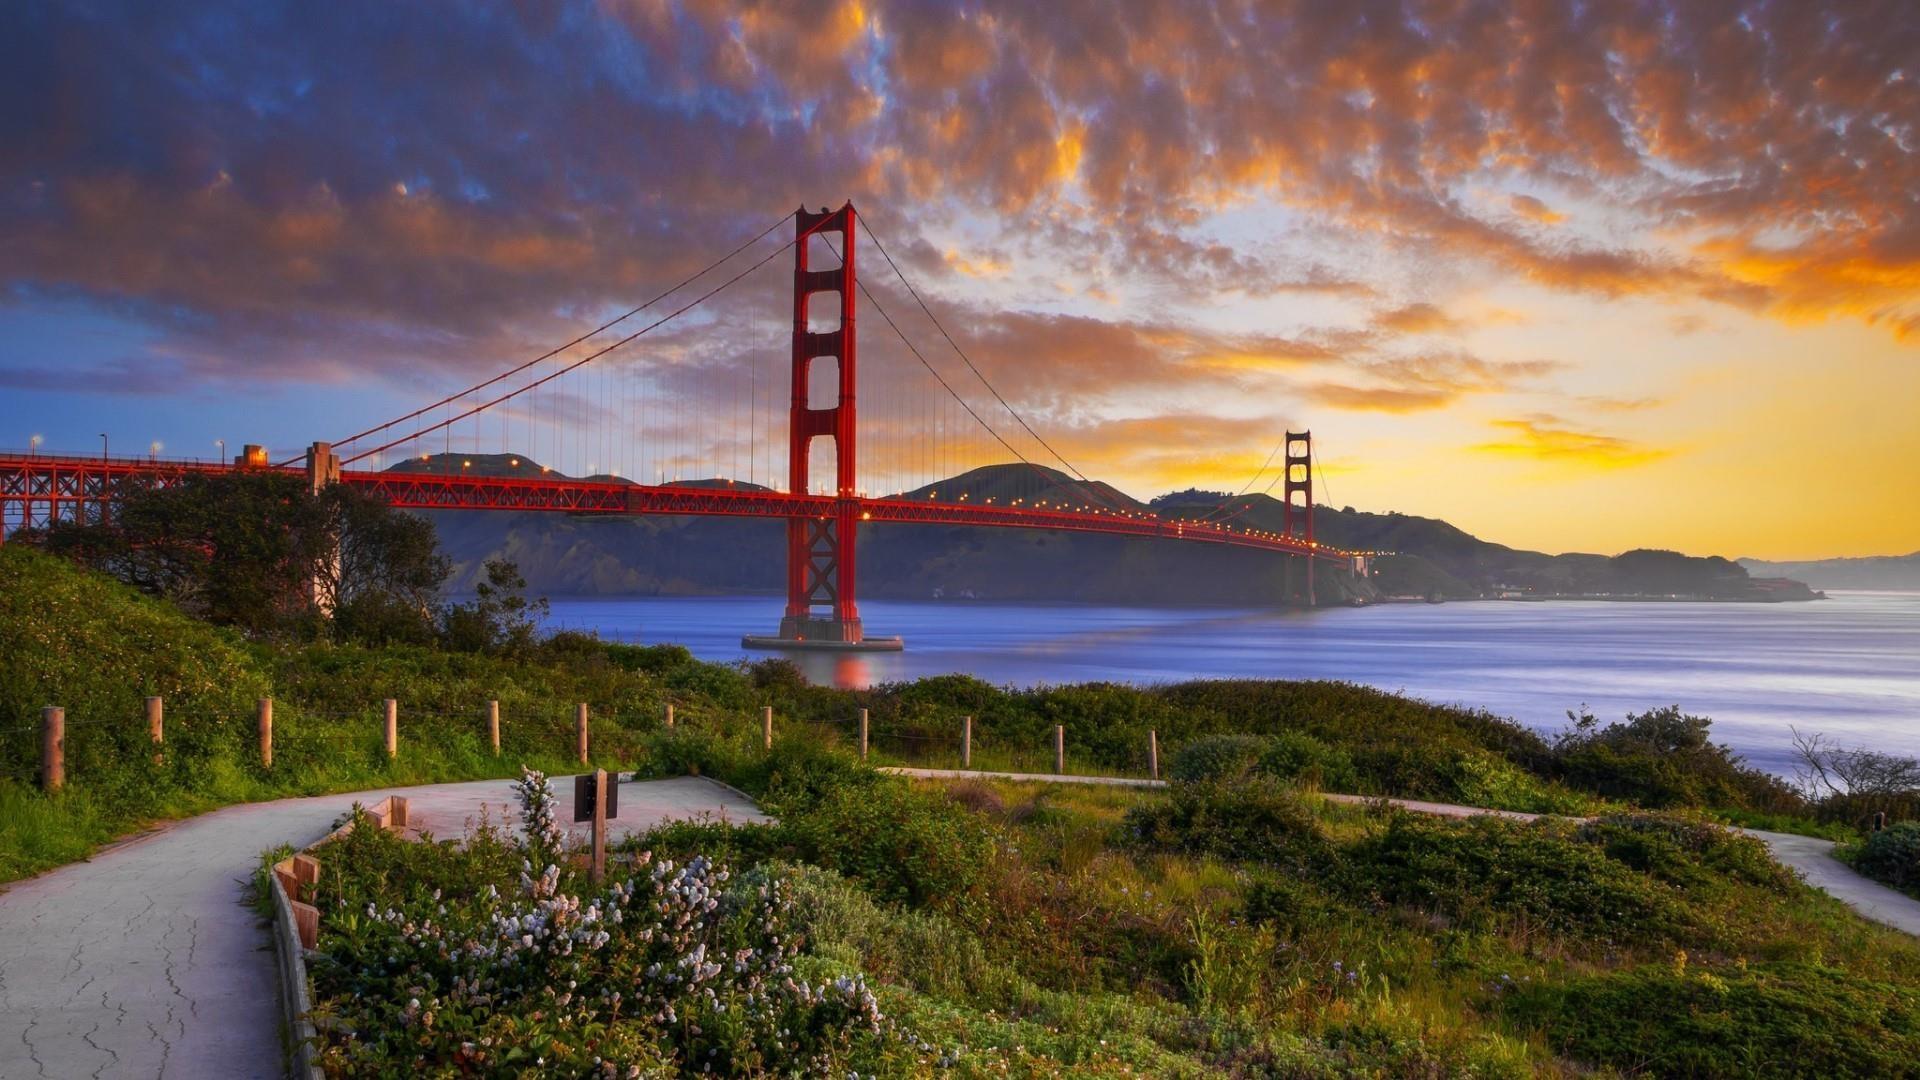 Windows 8 1 Wallpaper Hd Free Download Golden Gate Bridge Wallpaper 74 Pictures